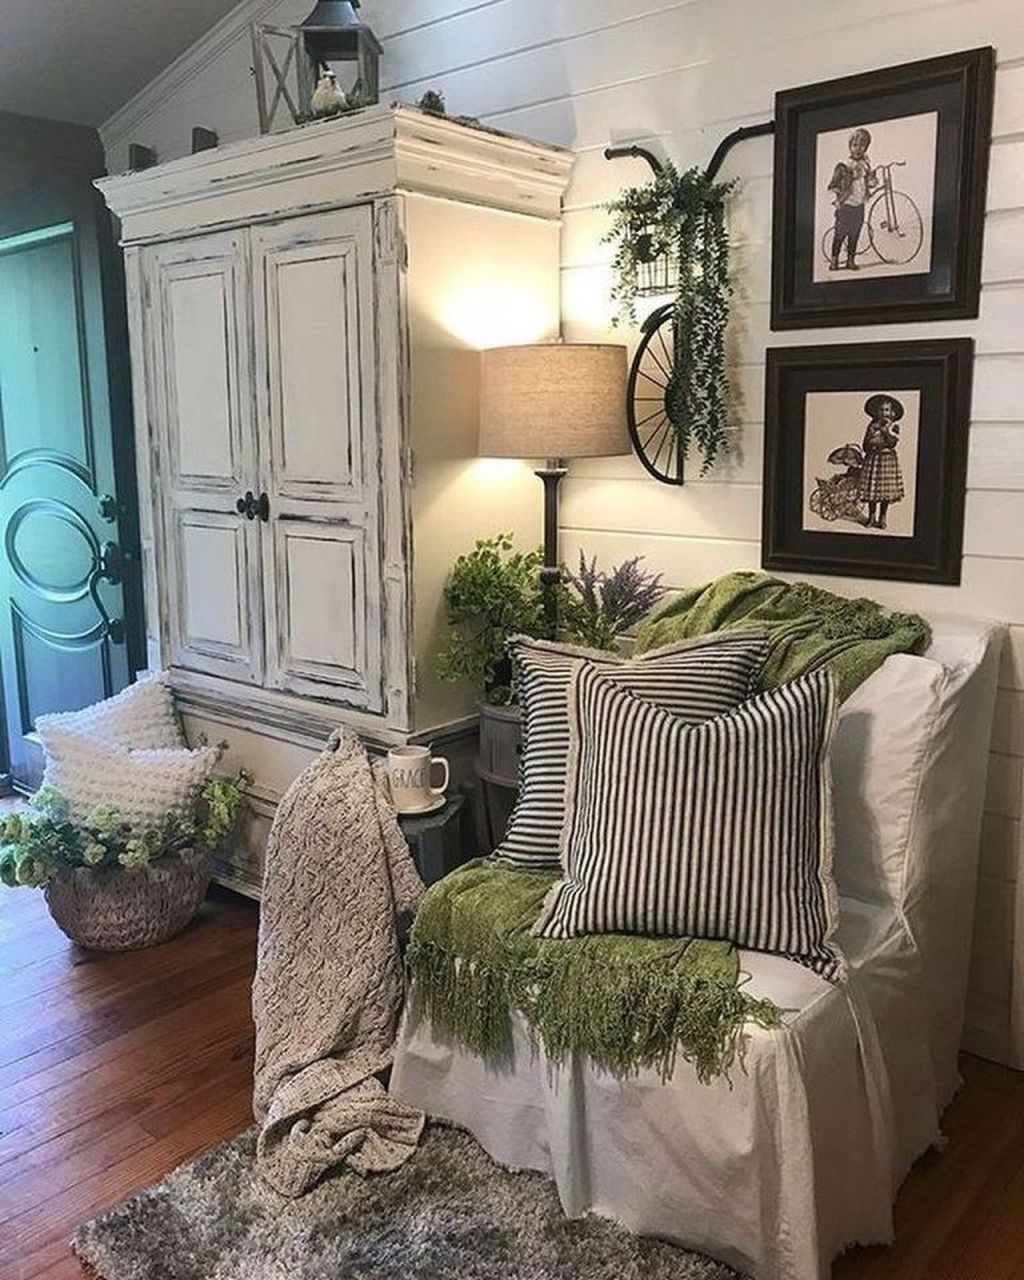 More Shabby Chic Halloween Interior Decor Ideas: 46 Popular Farmhouse Wall Decor Ideas